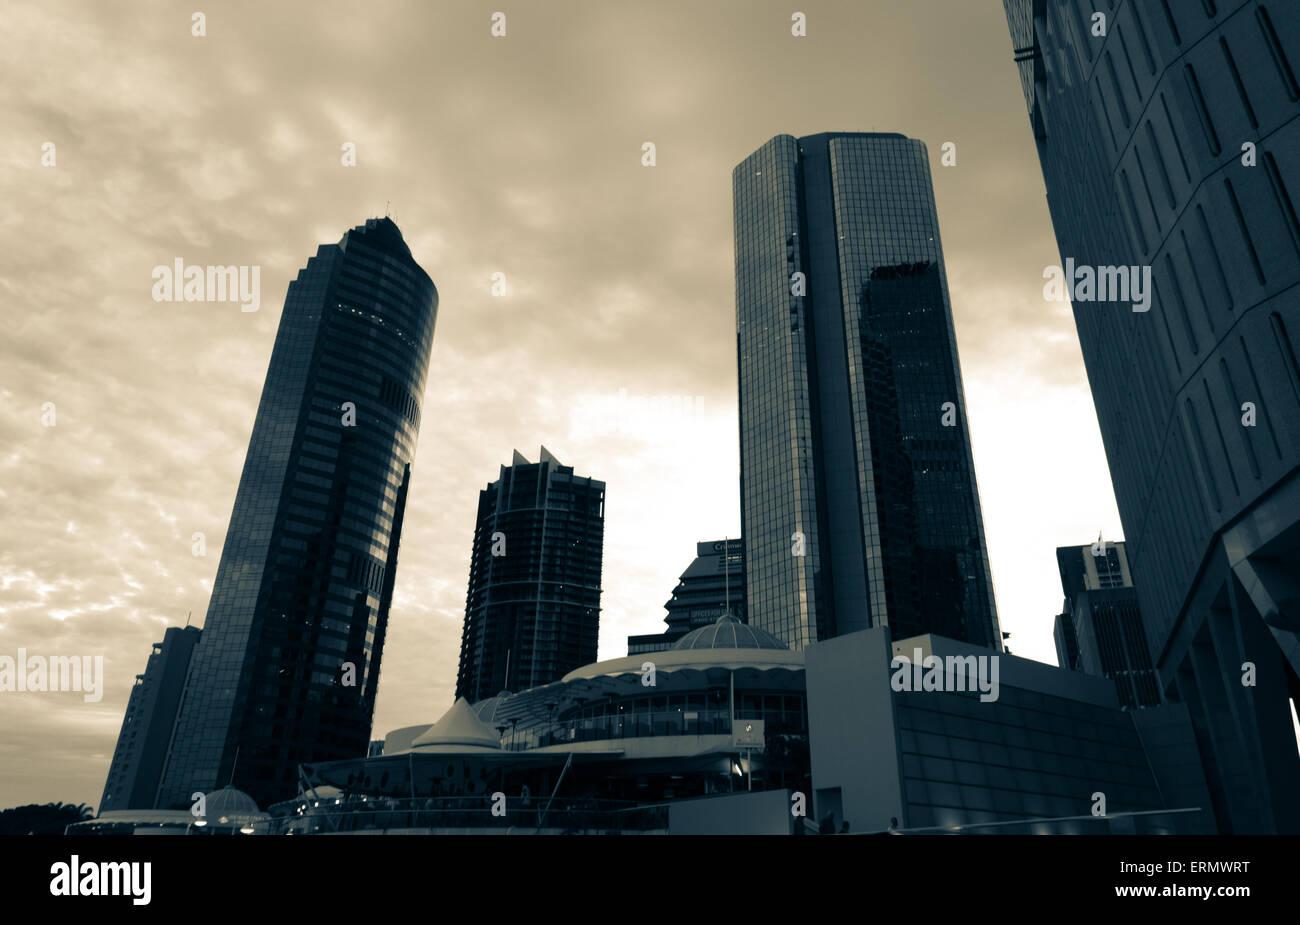 Skyscrapers Brisbane CBD - Stock Image